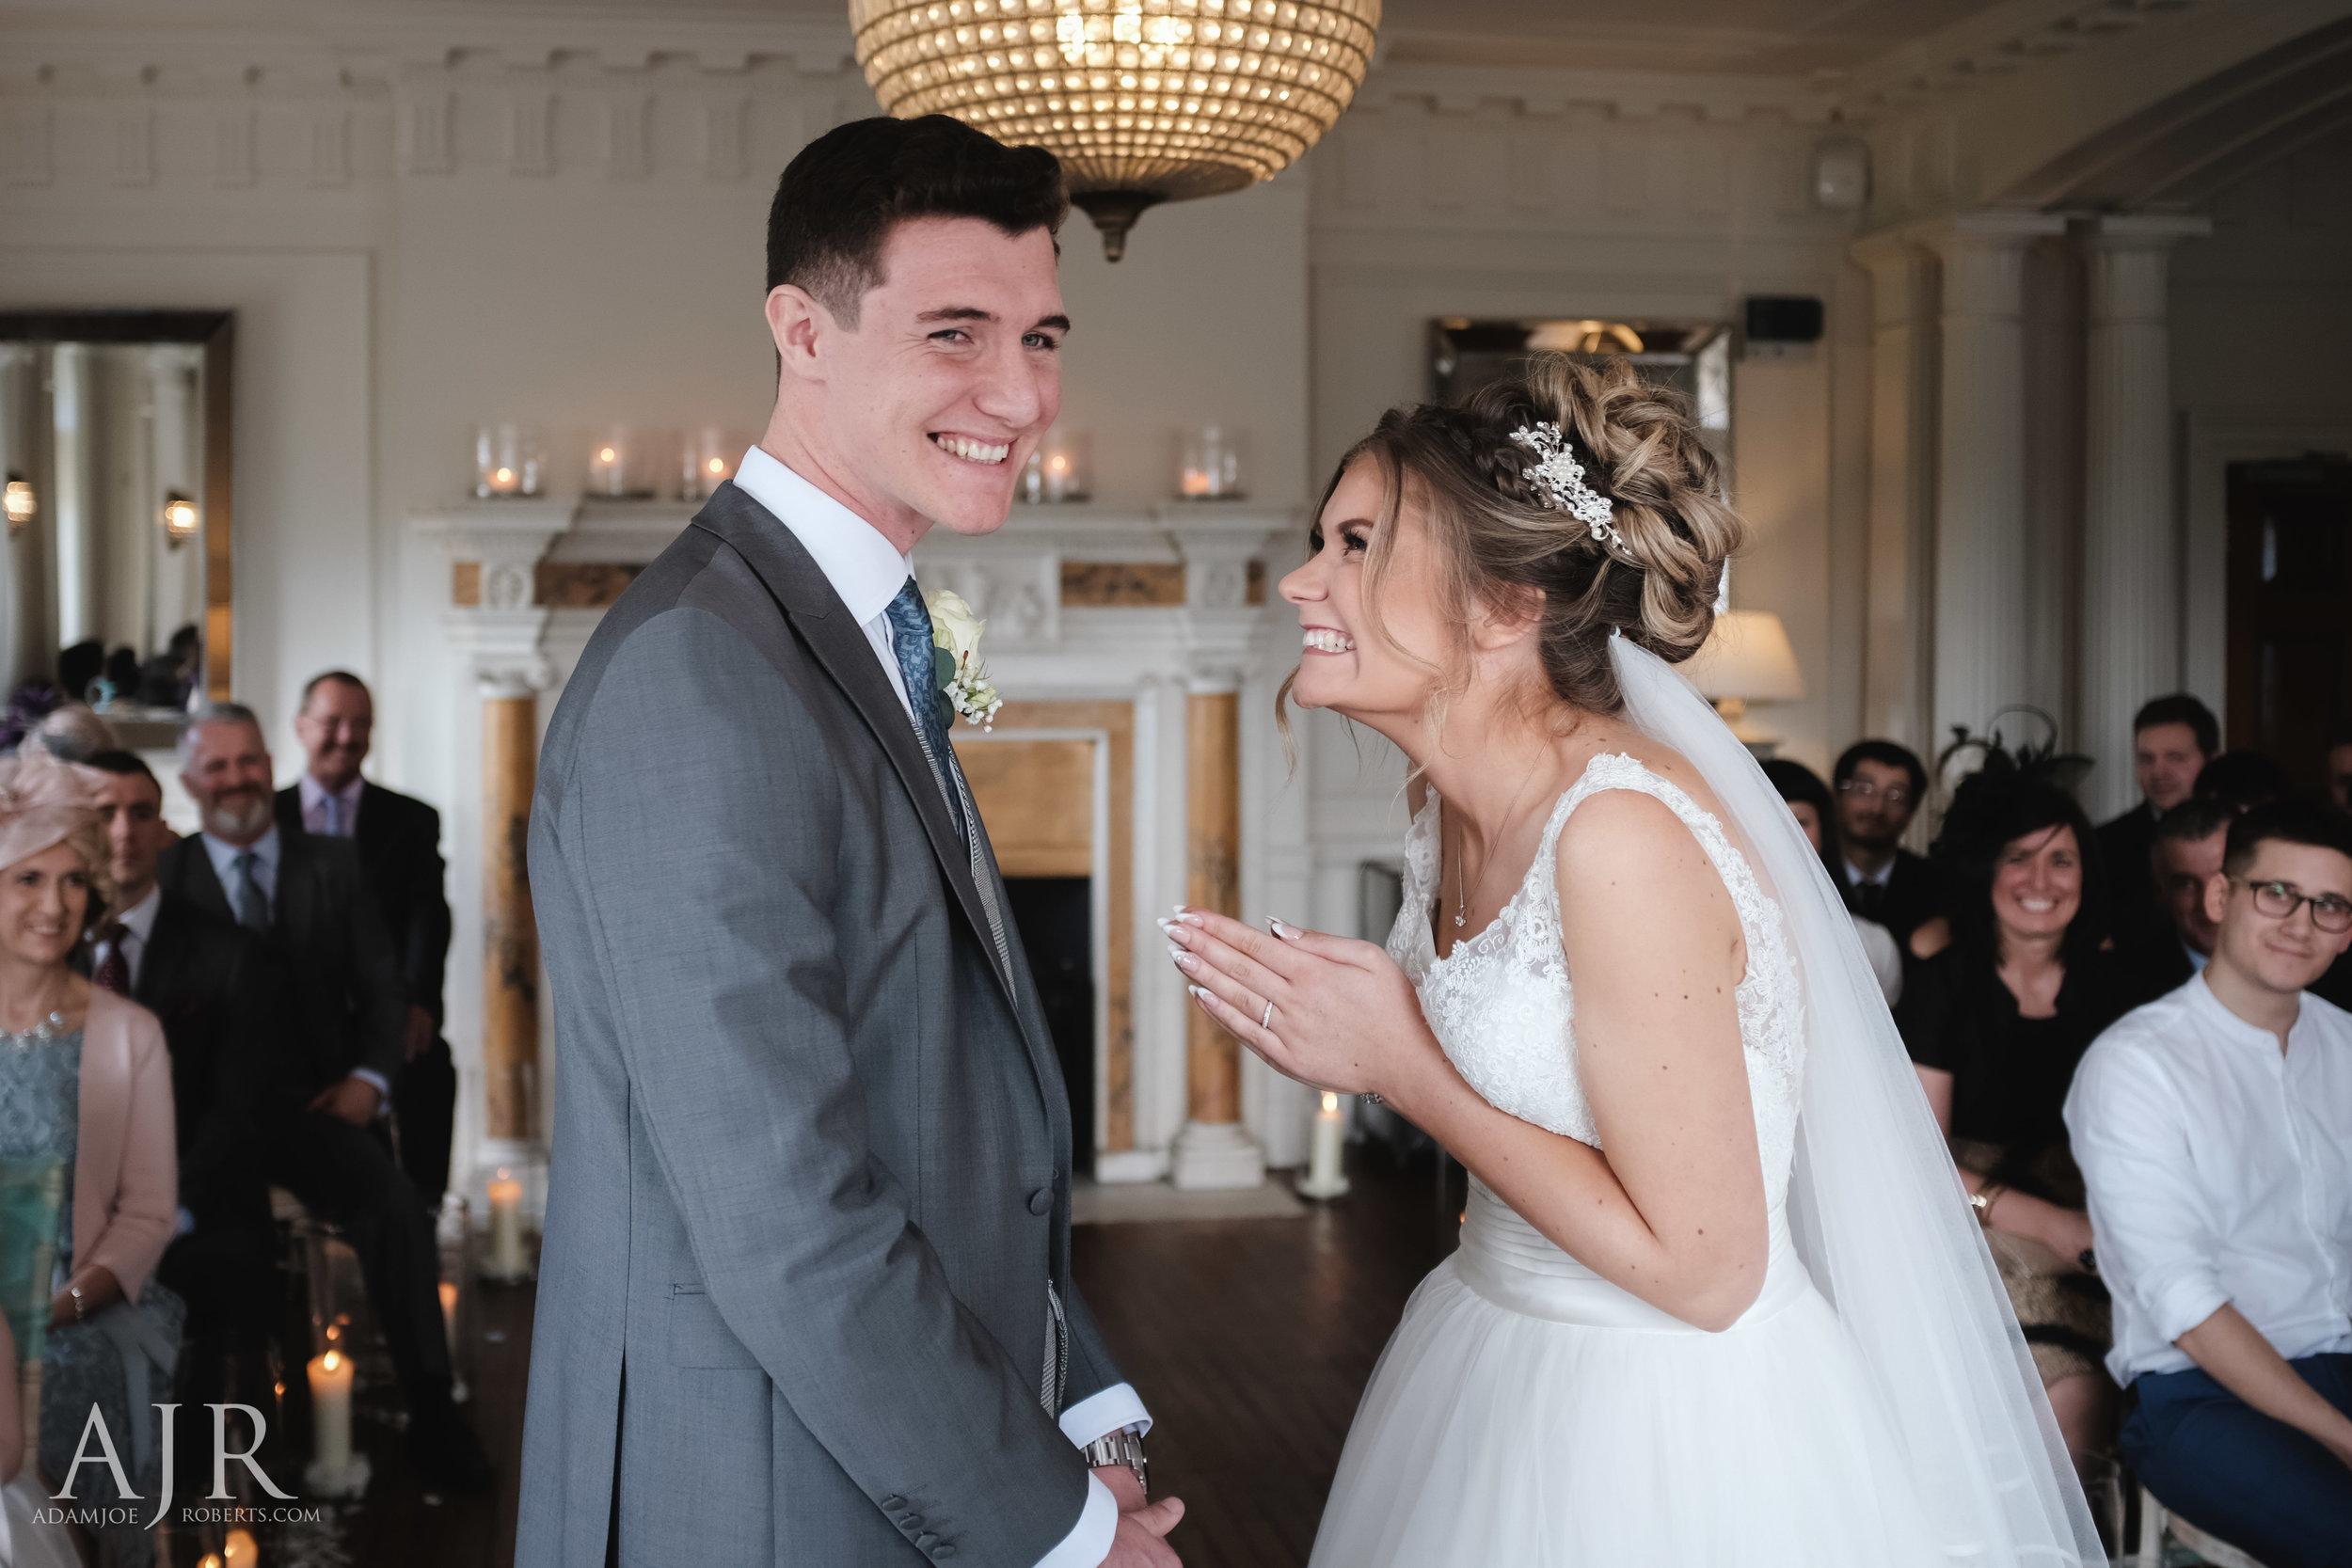 Eaves hall documenrty wedding photography | widnes cheshire wedding photographer sneak peek (4 of 11).jpg